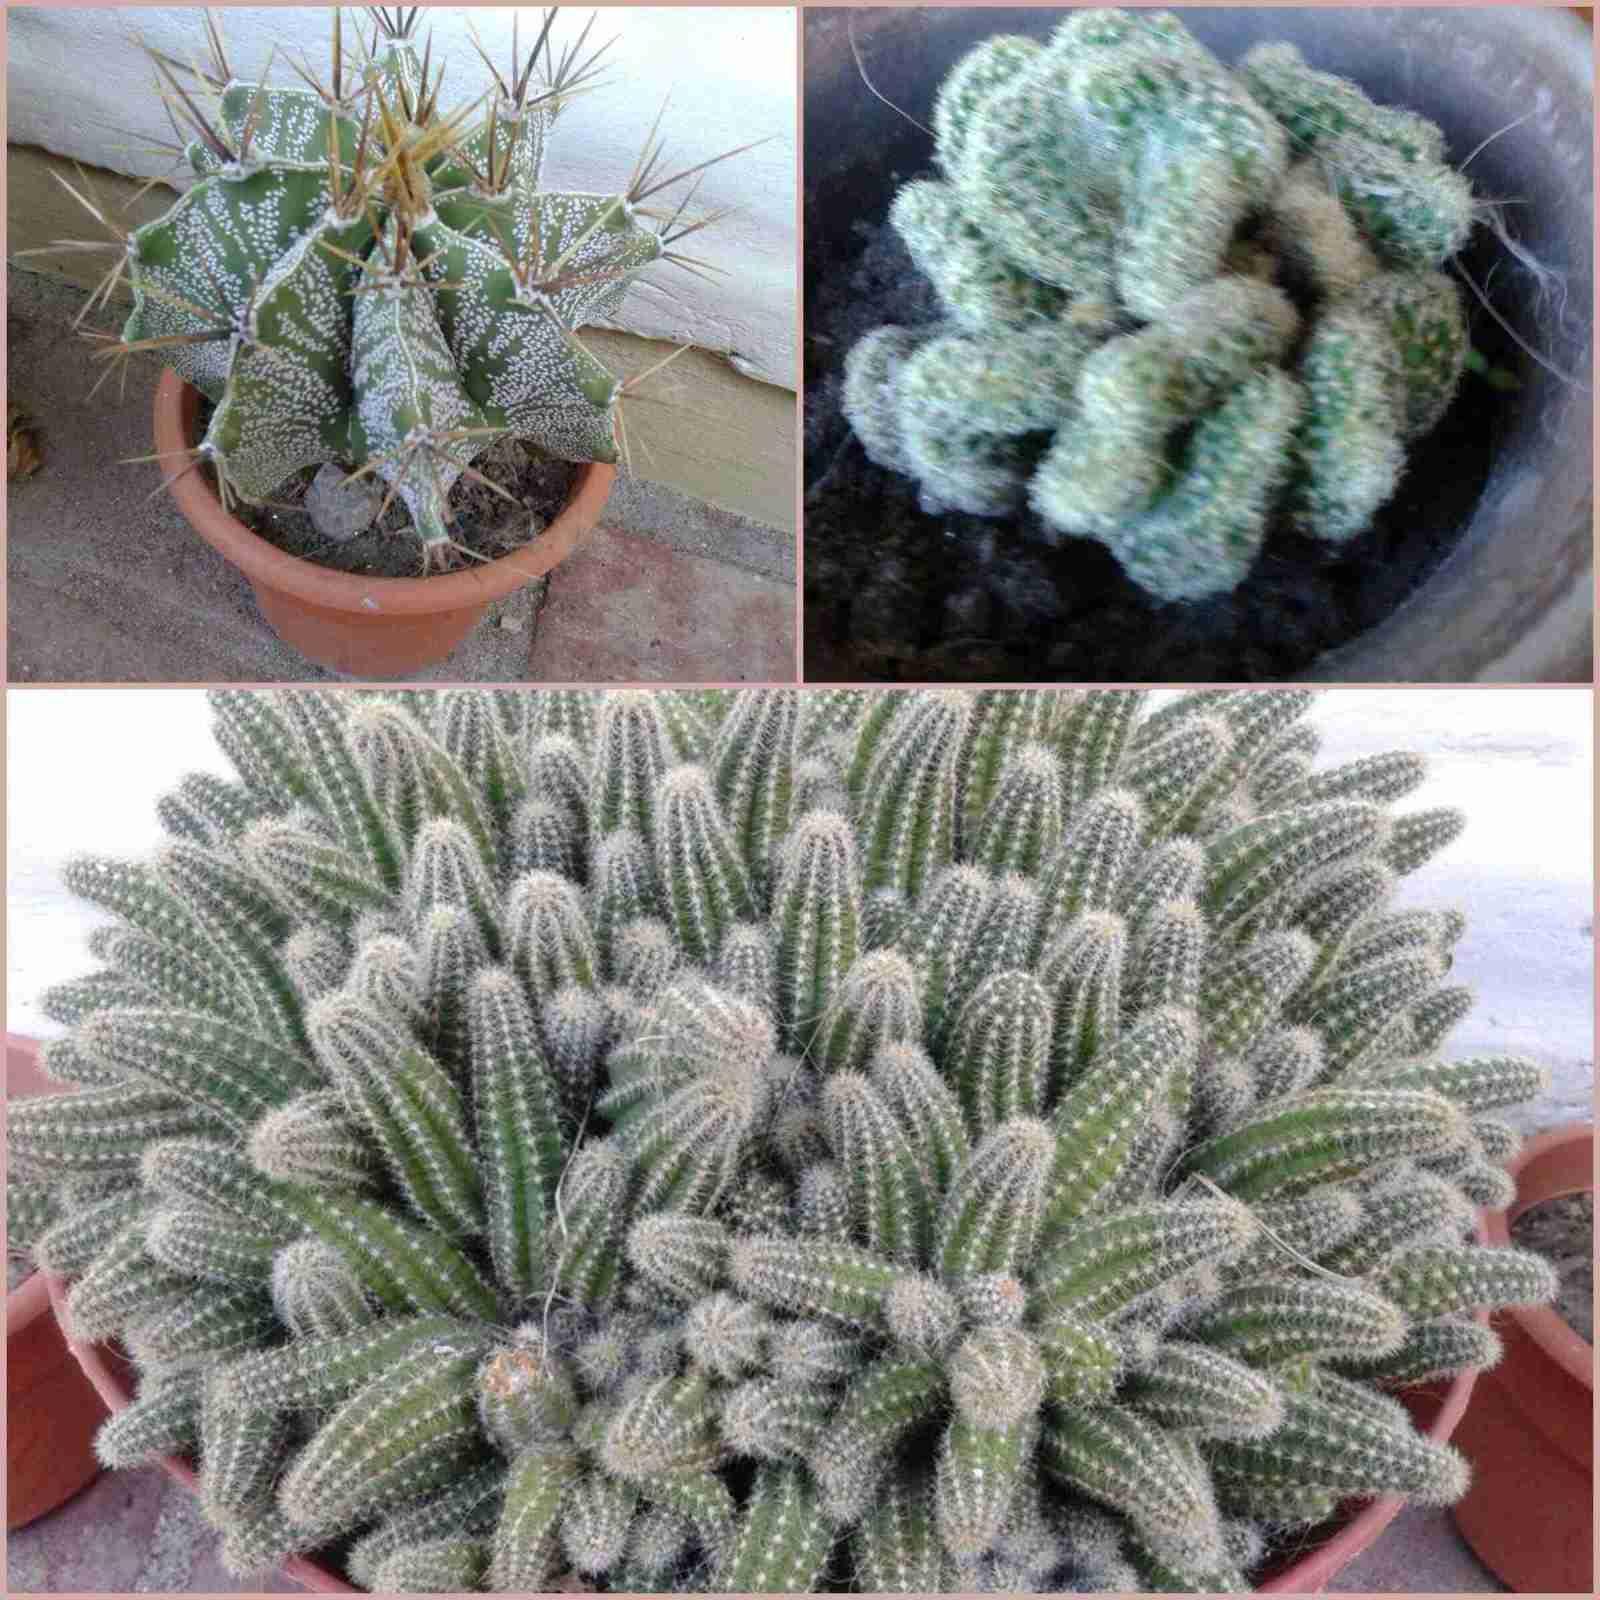 Astrophytum Ornatum de Maria Angeles y mas - Mis Plantas, Tus Plantas 3